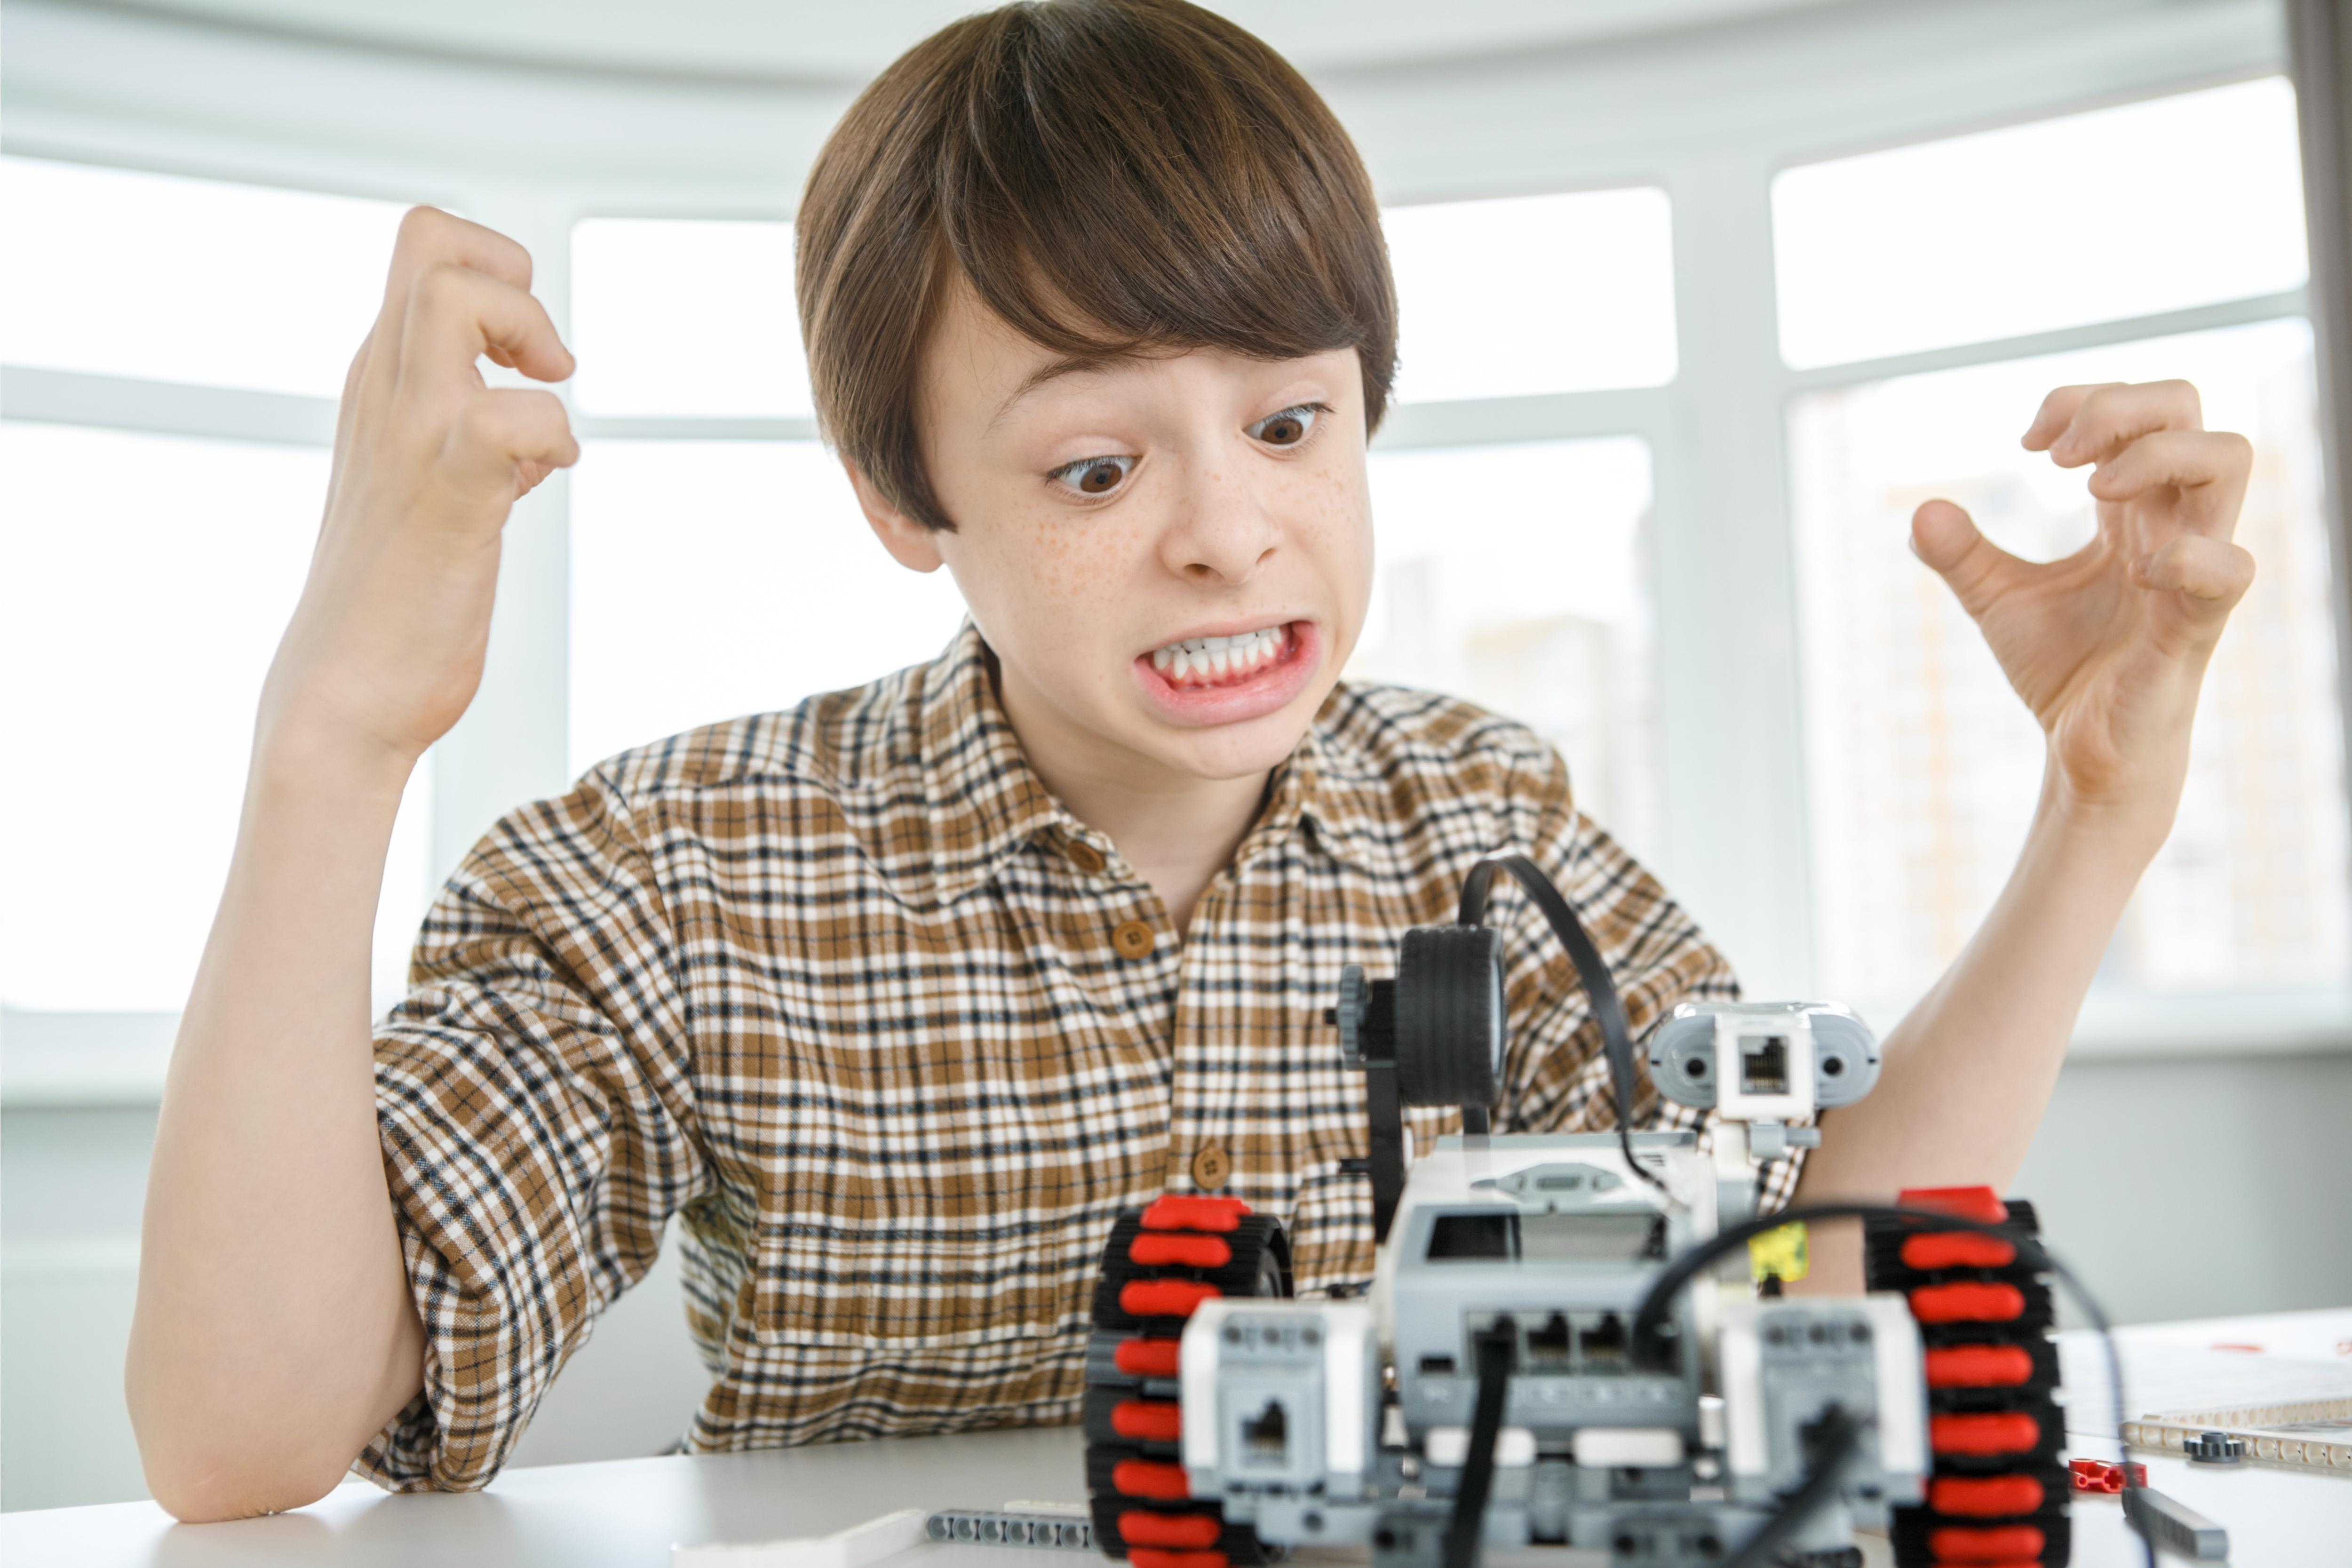 Novatia-school-ICT-blockers-boy